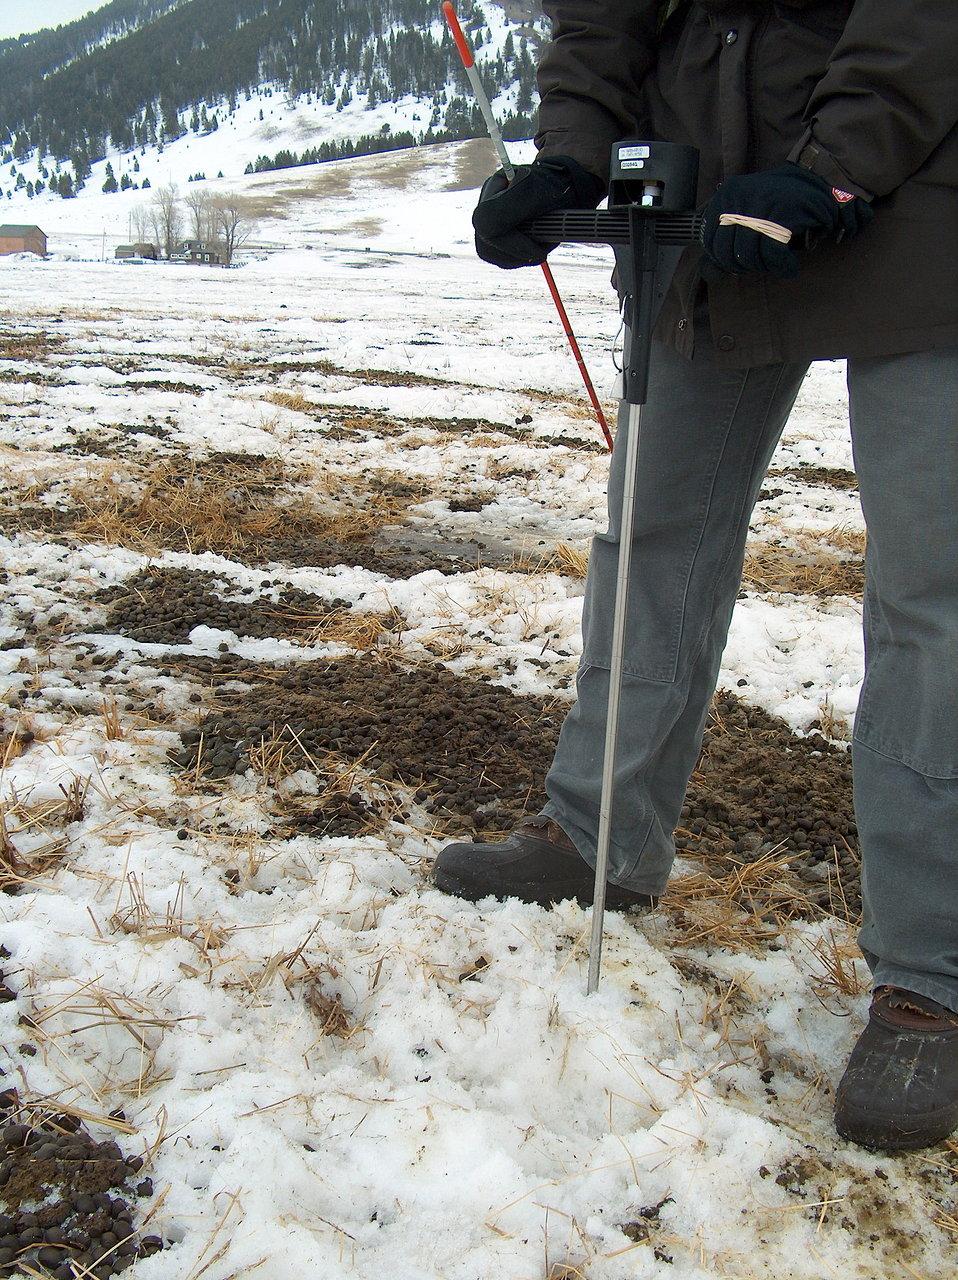 Collecting Environmental Data at the National Elk Refuge